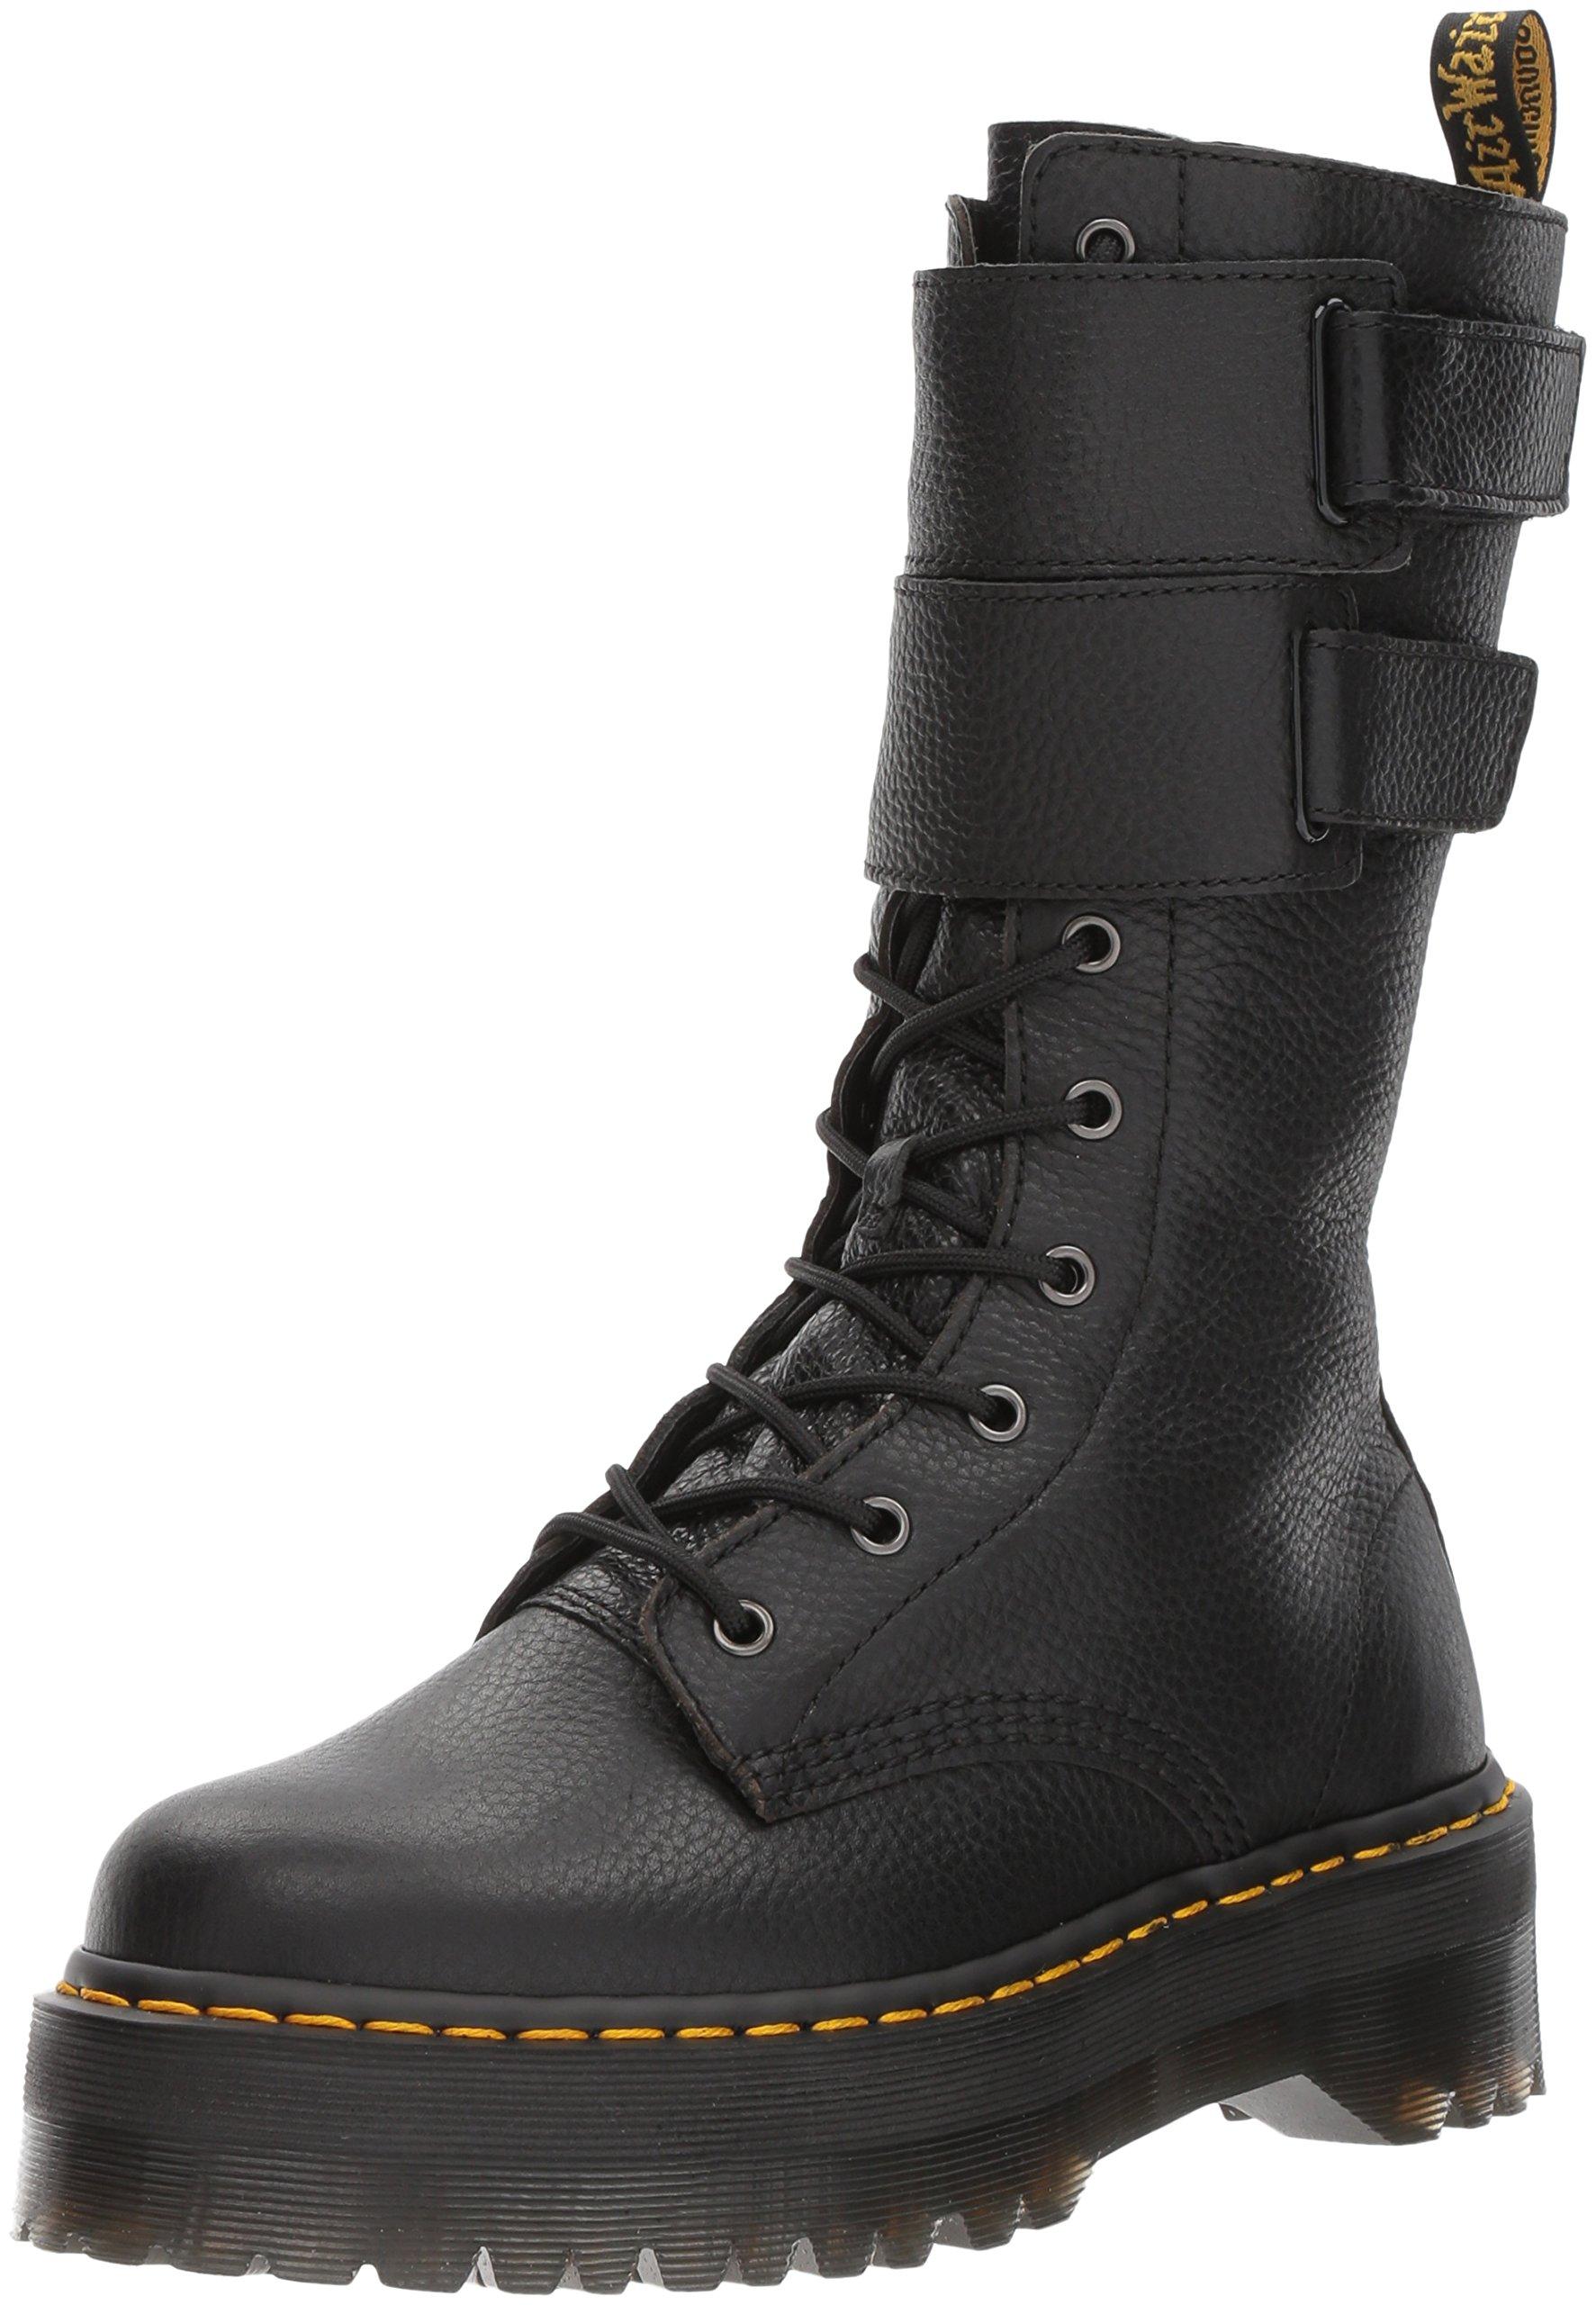 Dr. Martens Women's Jagger Fashion Boot, Black, 5 Medium UK (7 US) by Dr. Martens